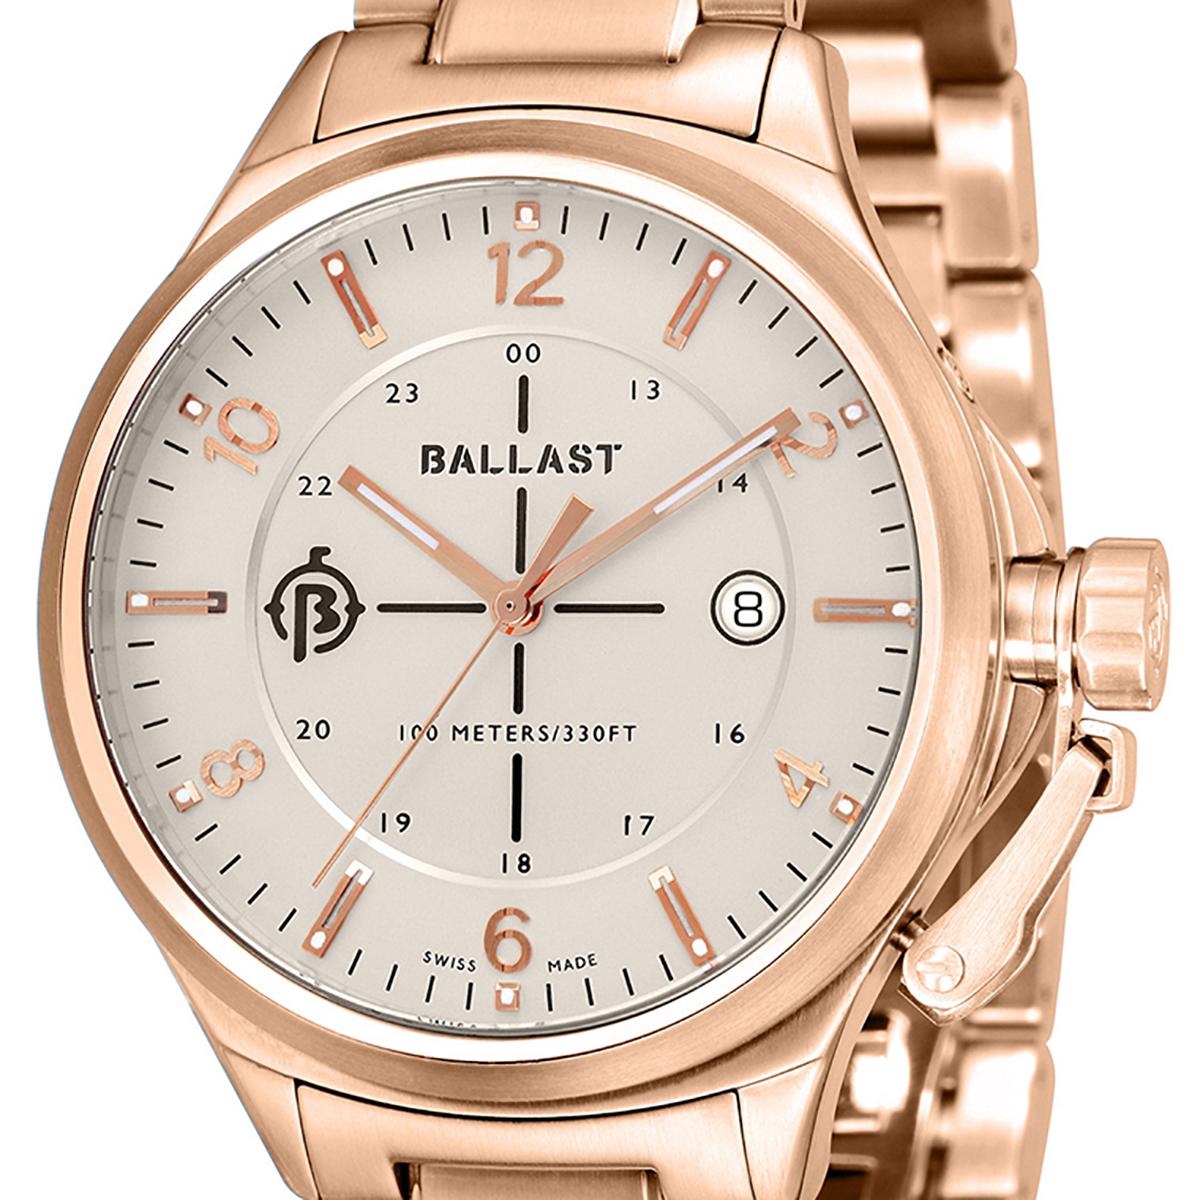 BALLAST バラスト クォーツ 腕時計 メンズ ミリタリー イギリス SWISS MADE [BL-3125-33] 並行輸入品 純正ケース メーカー保証24ヶ月